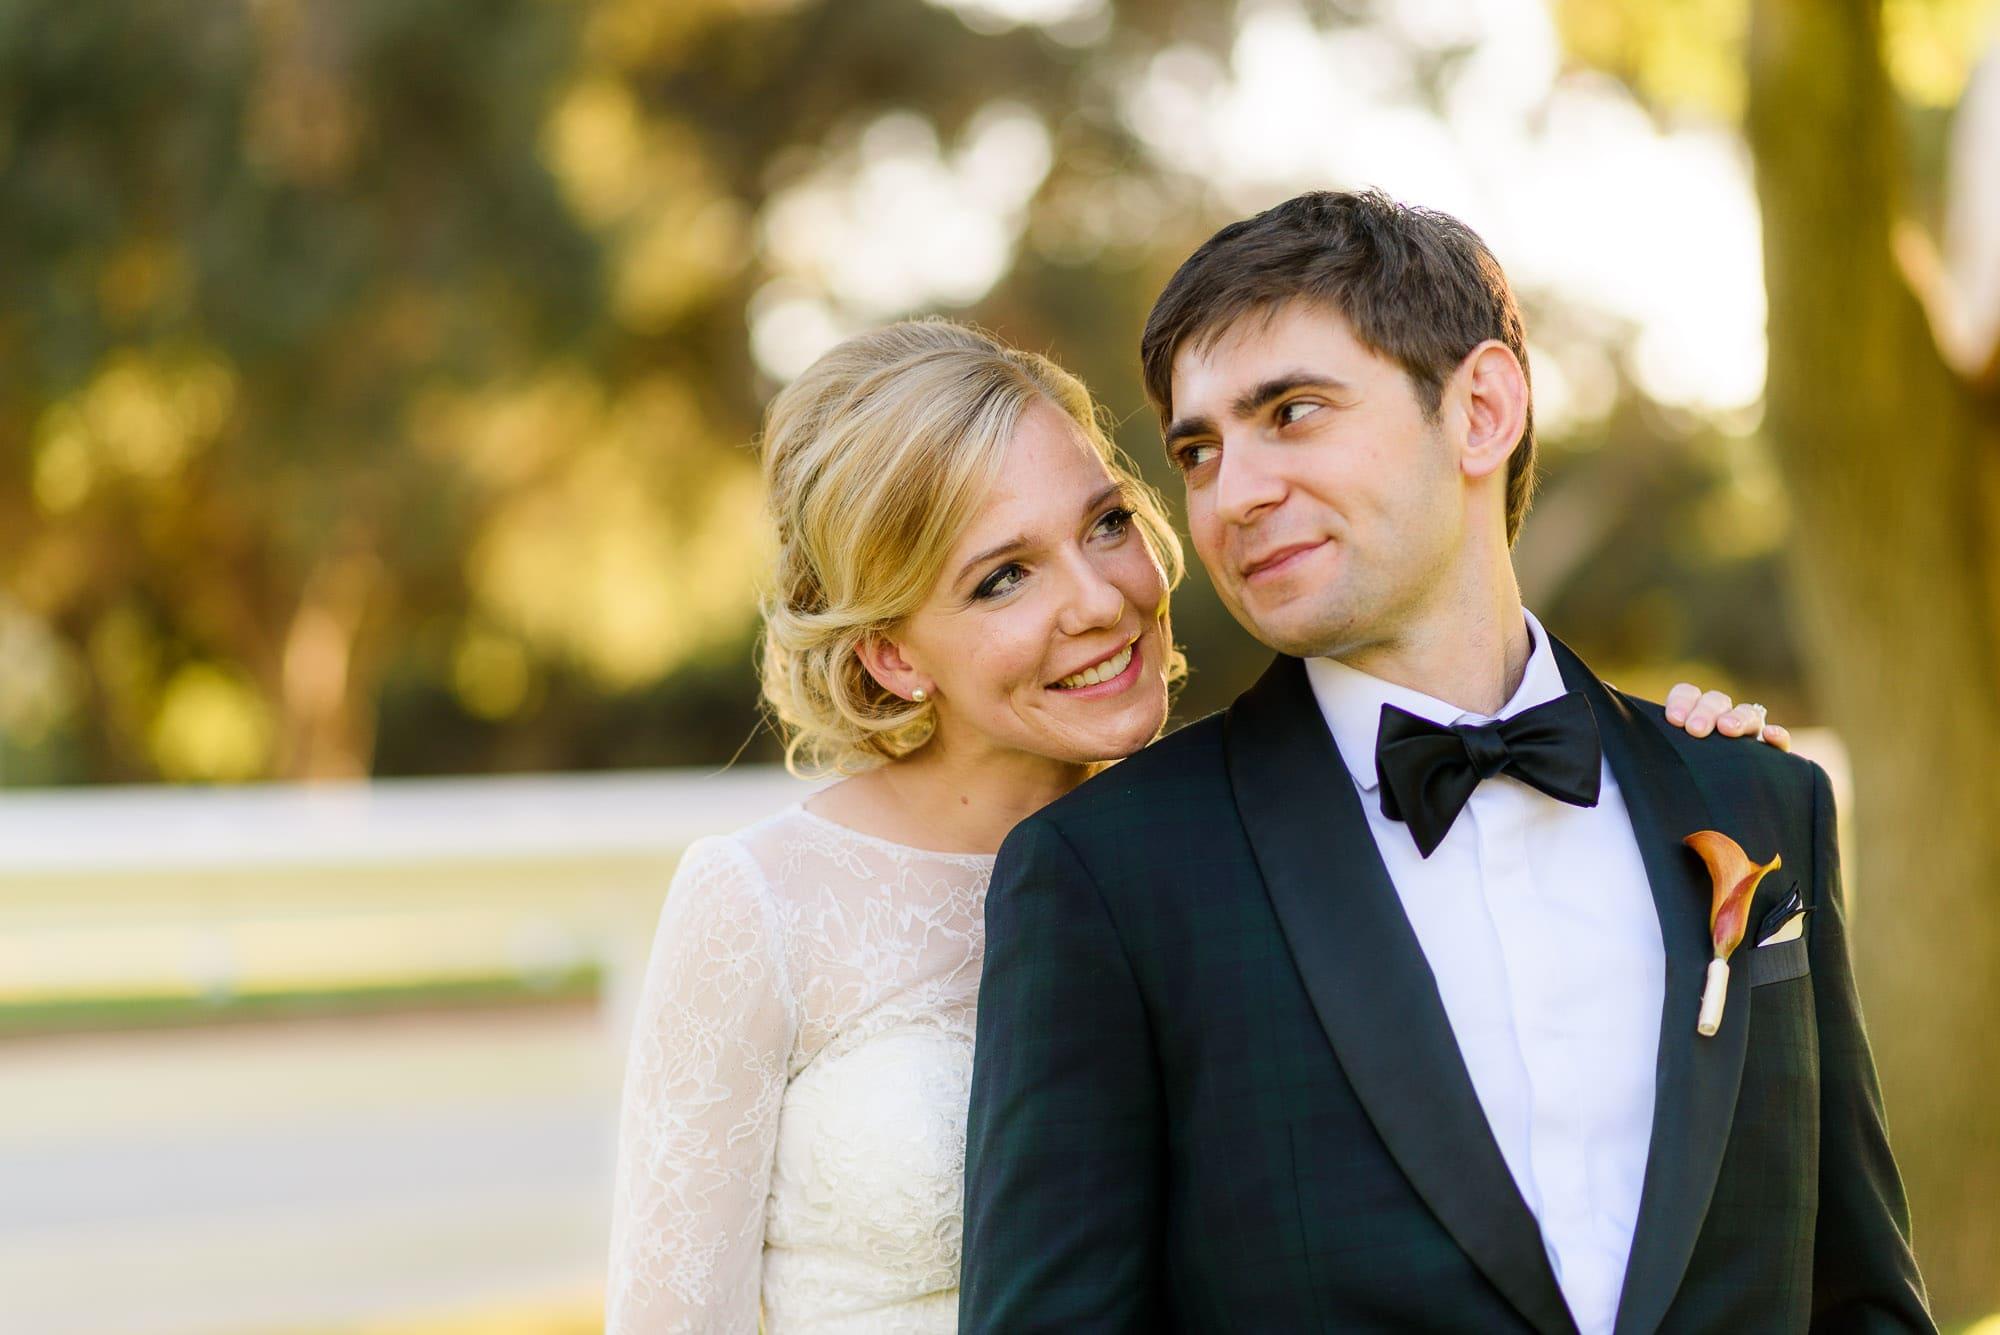 029_Alan_and_Heidi_Los_Angeles_Equestrian_Center_Wedding